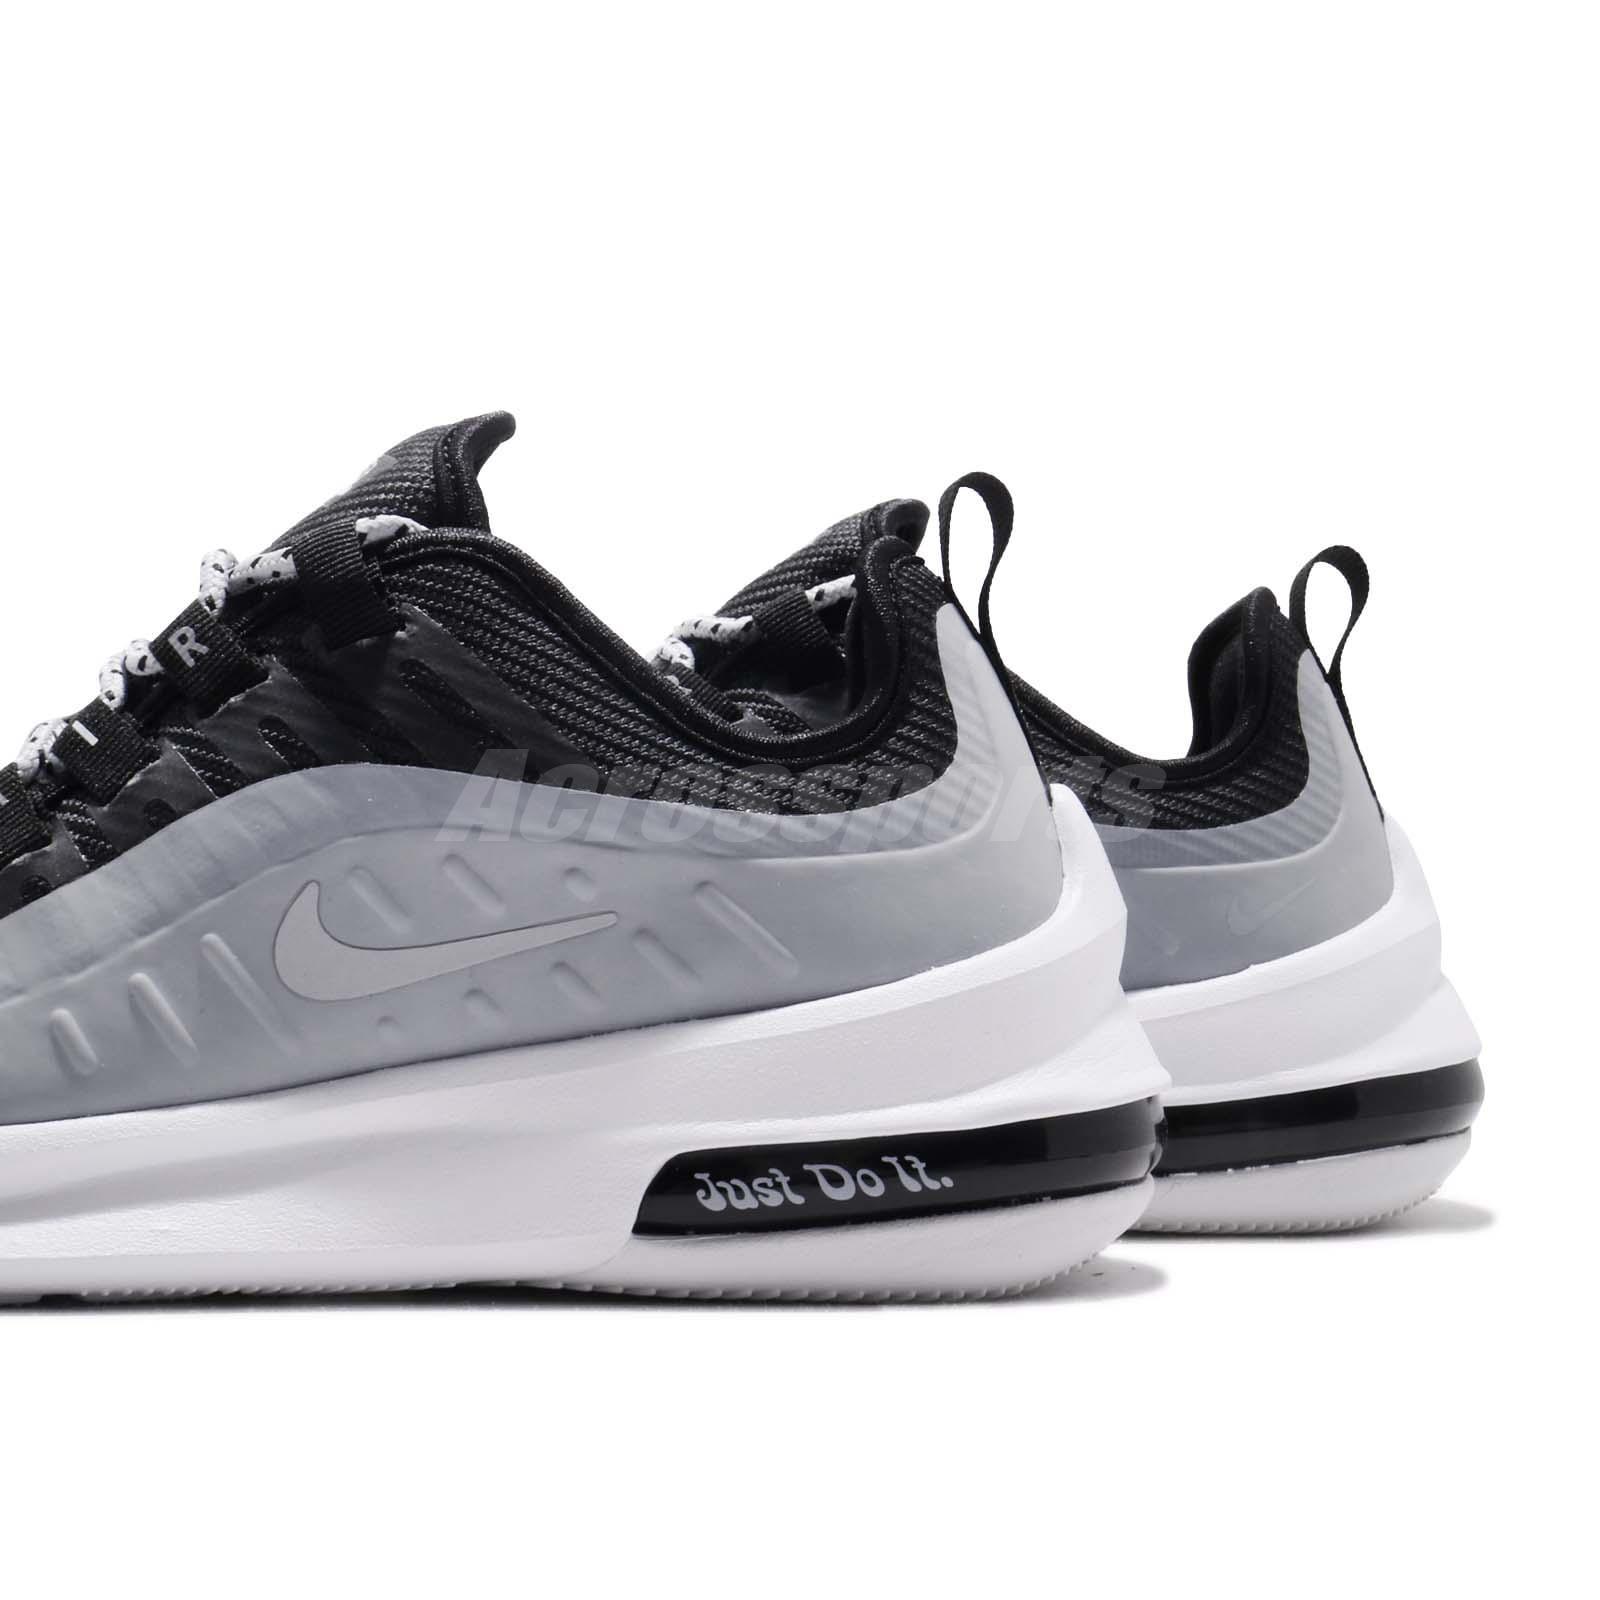 090703e479a64 Nike Wmns Air Max Axis SE Black Grey White Women Running Shoe ...